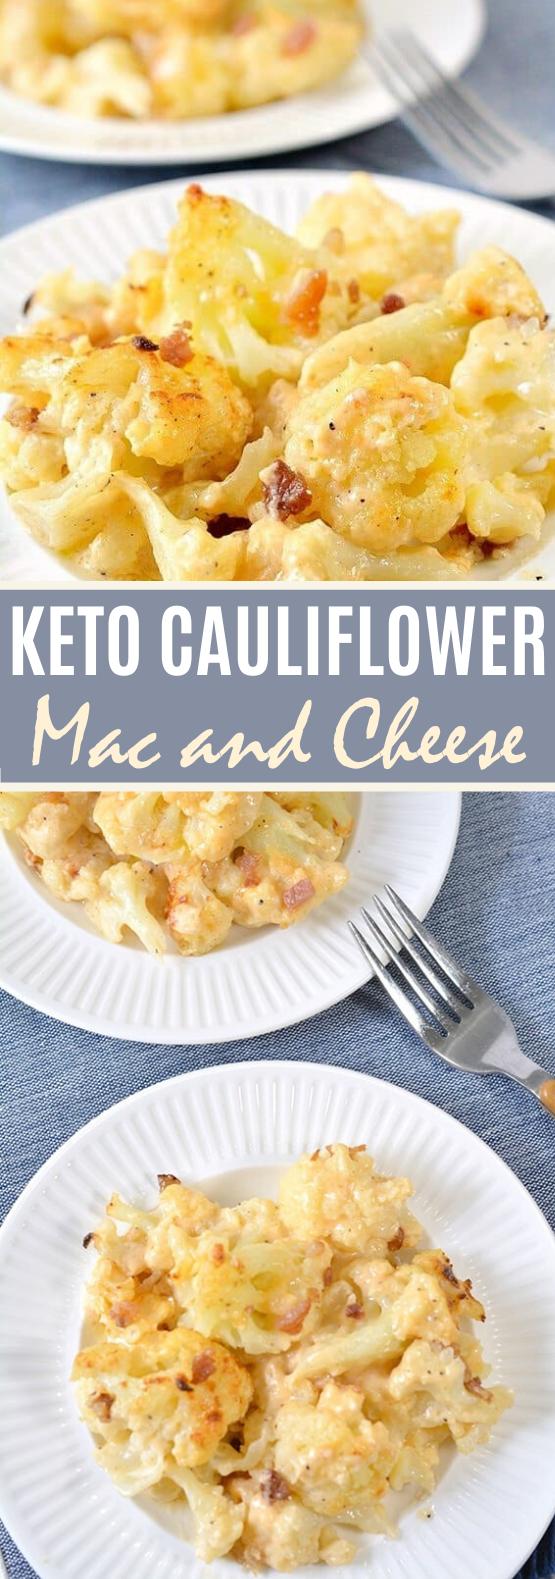 Keto Cauliflower Mac and Cheese #healthy #dinner #lowcarb #diet #vegetarian